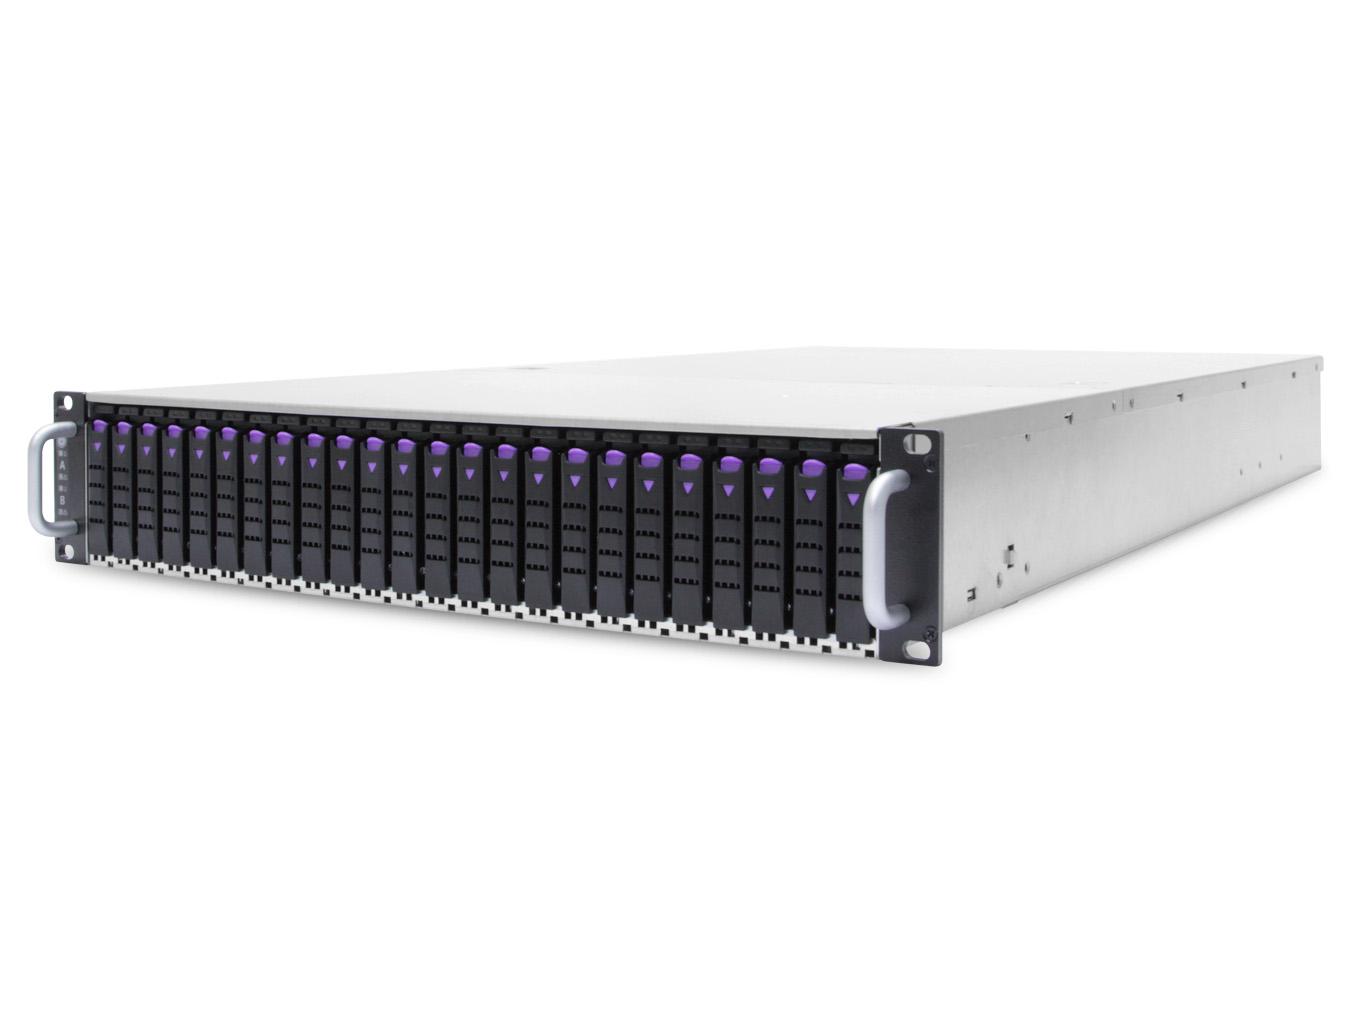 AIC HA202-PH XP1-A202PH01 2U 24-Bay NVMe Storage Server